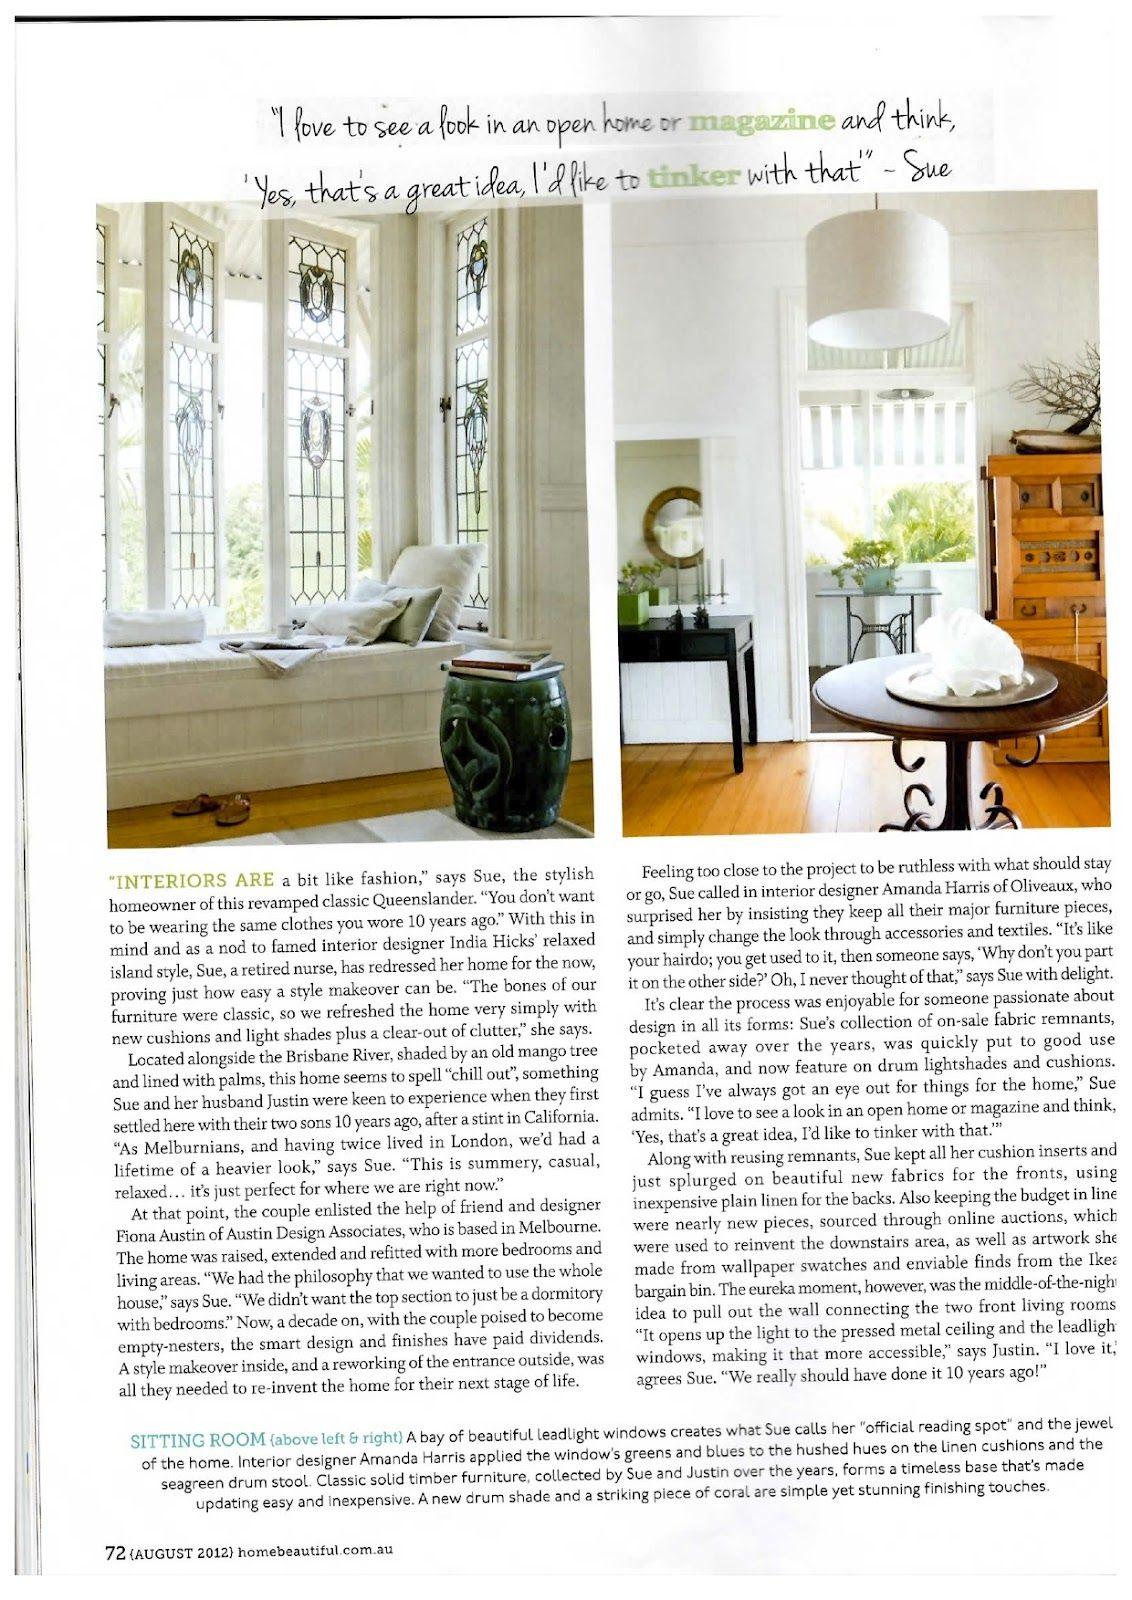 Enjoyable Oliveaux Cottage Design Ideas Australian Interior Design Download Free Architecture Designs Sospemadebymaigaardcom